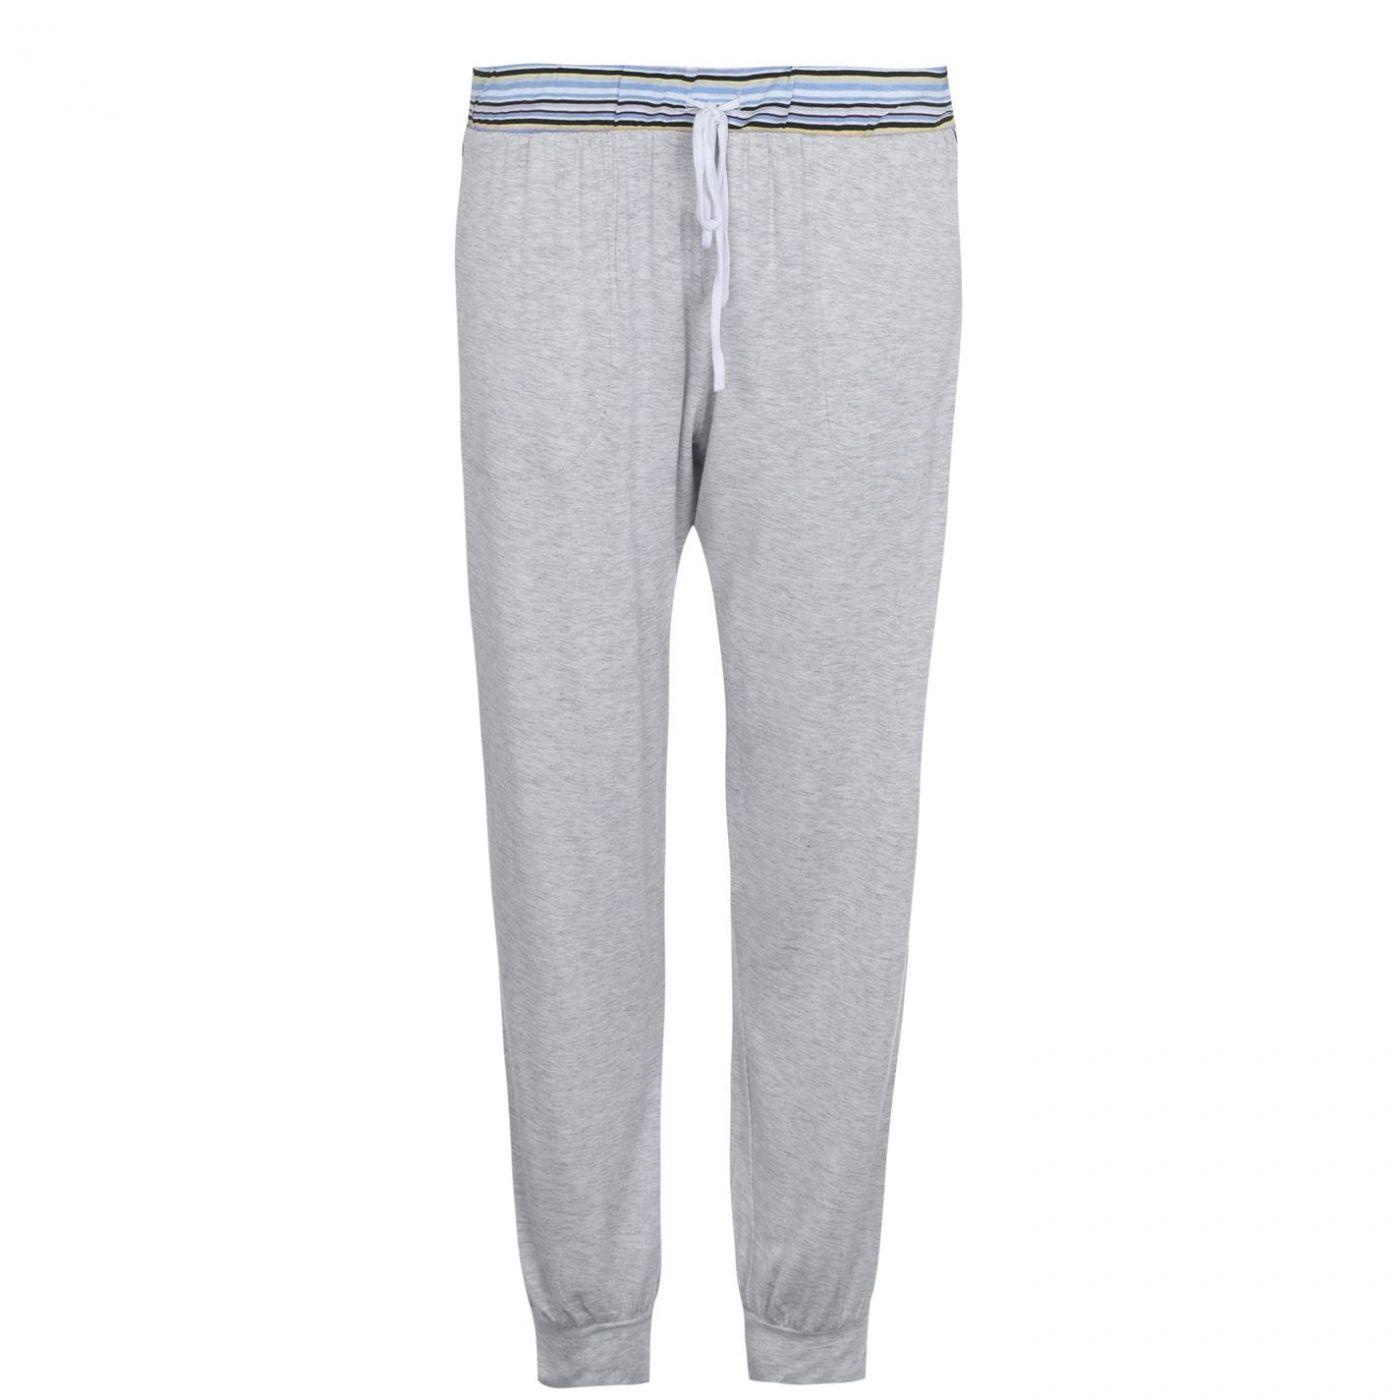 DKNY Jogger Pyjama Bottoms Ladies